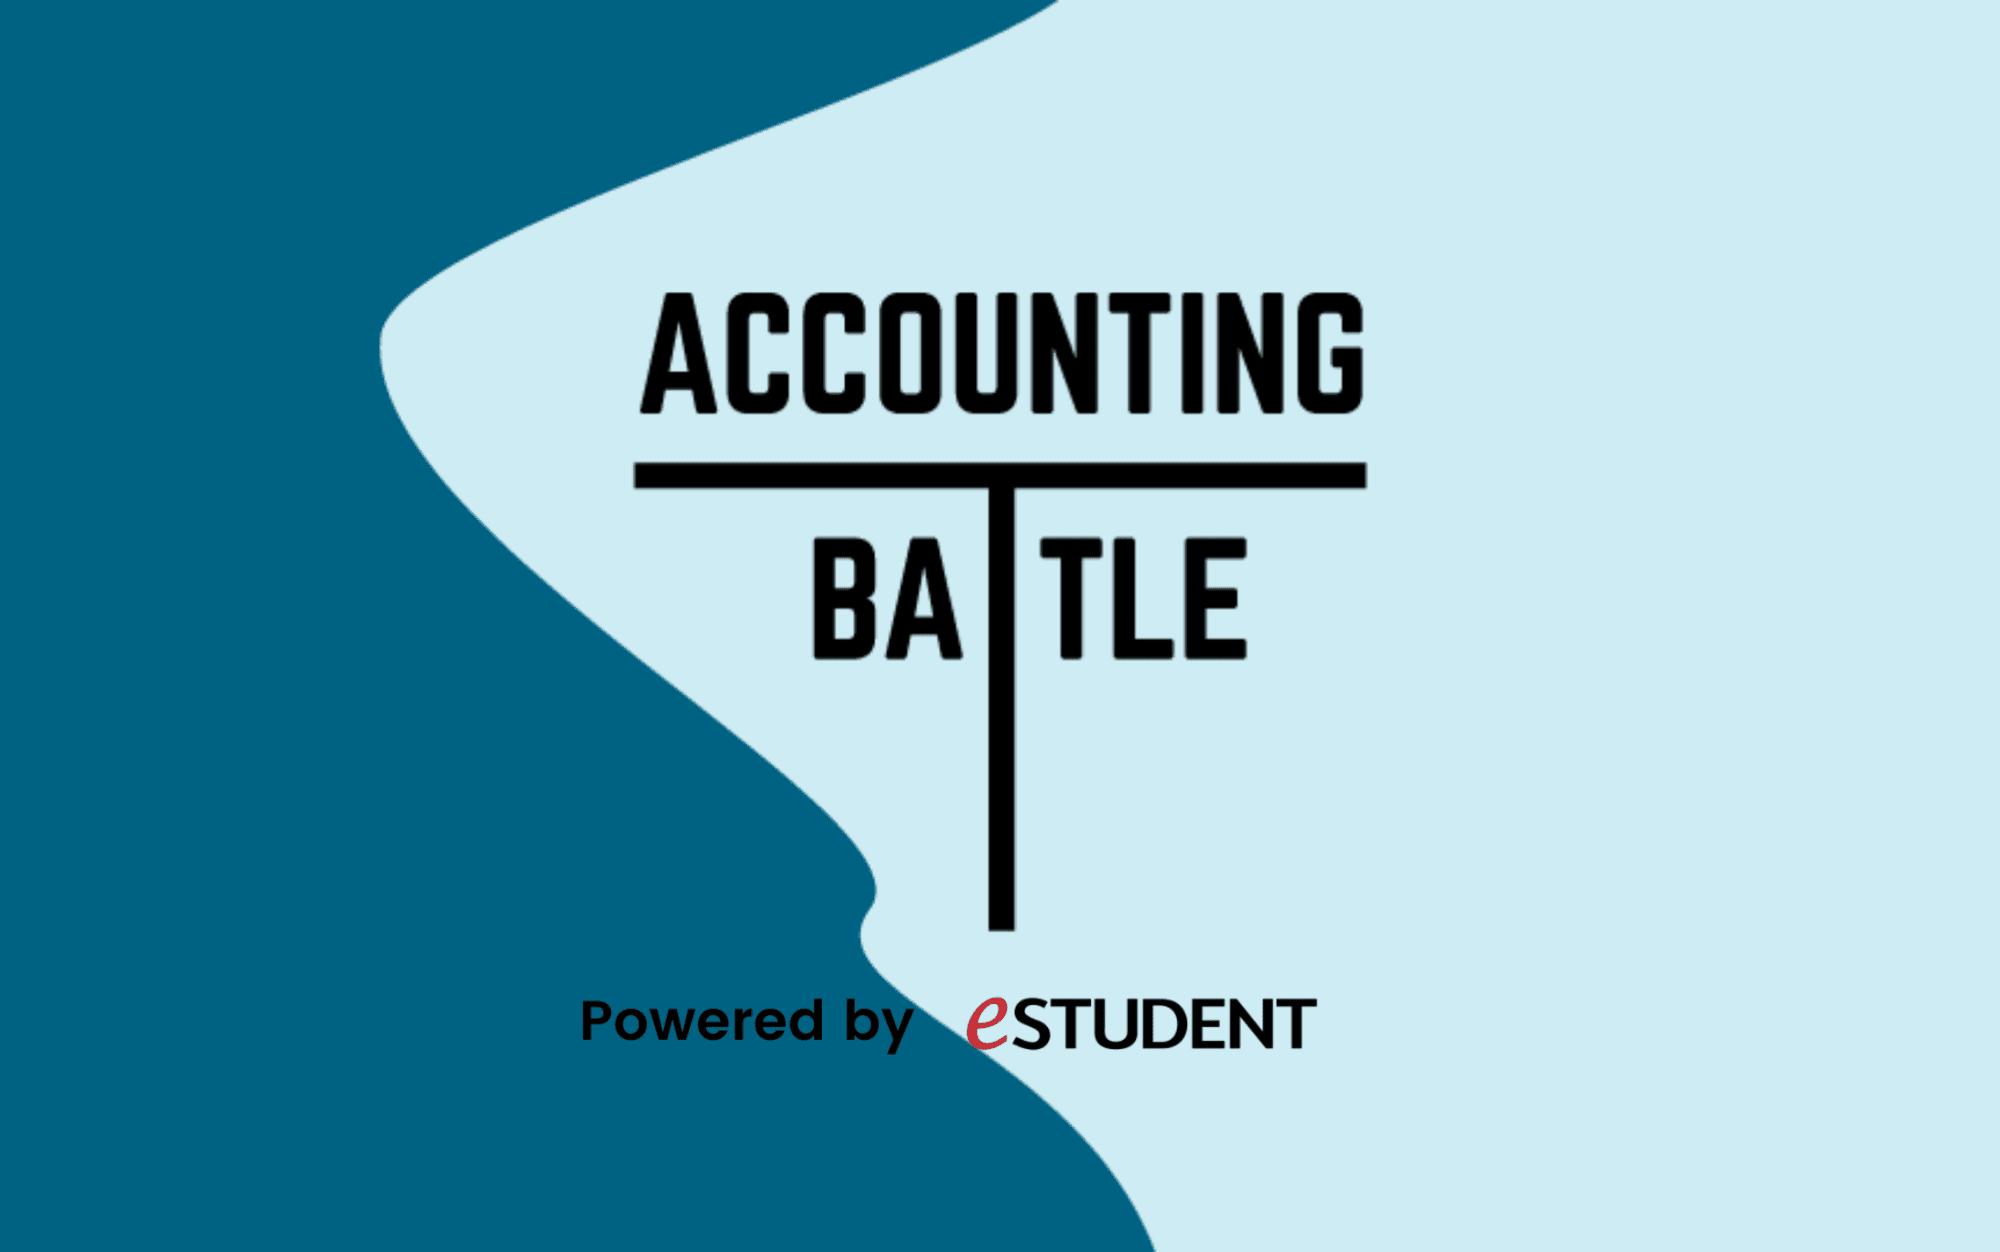 Accounting Battle u potrazi za partnerskim poduzećima